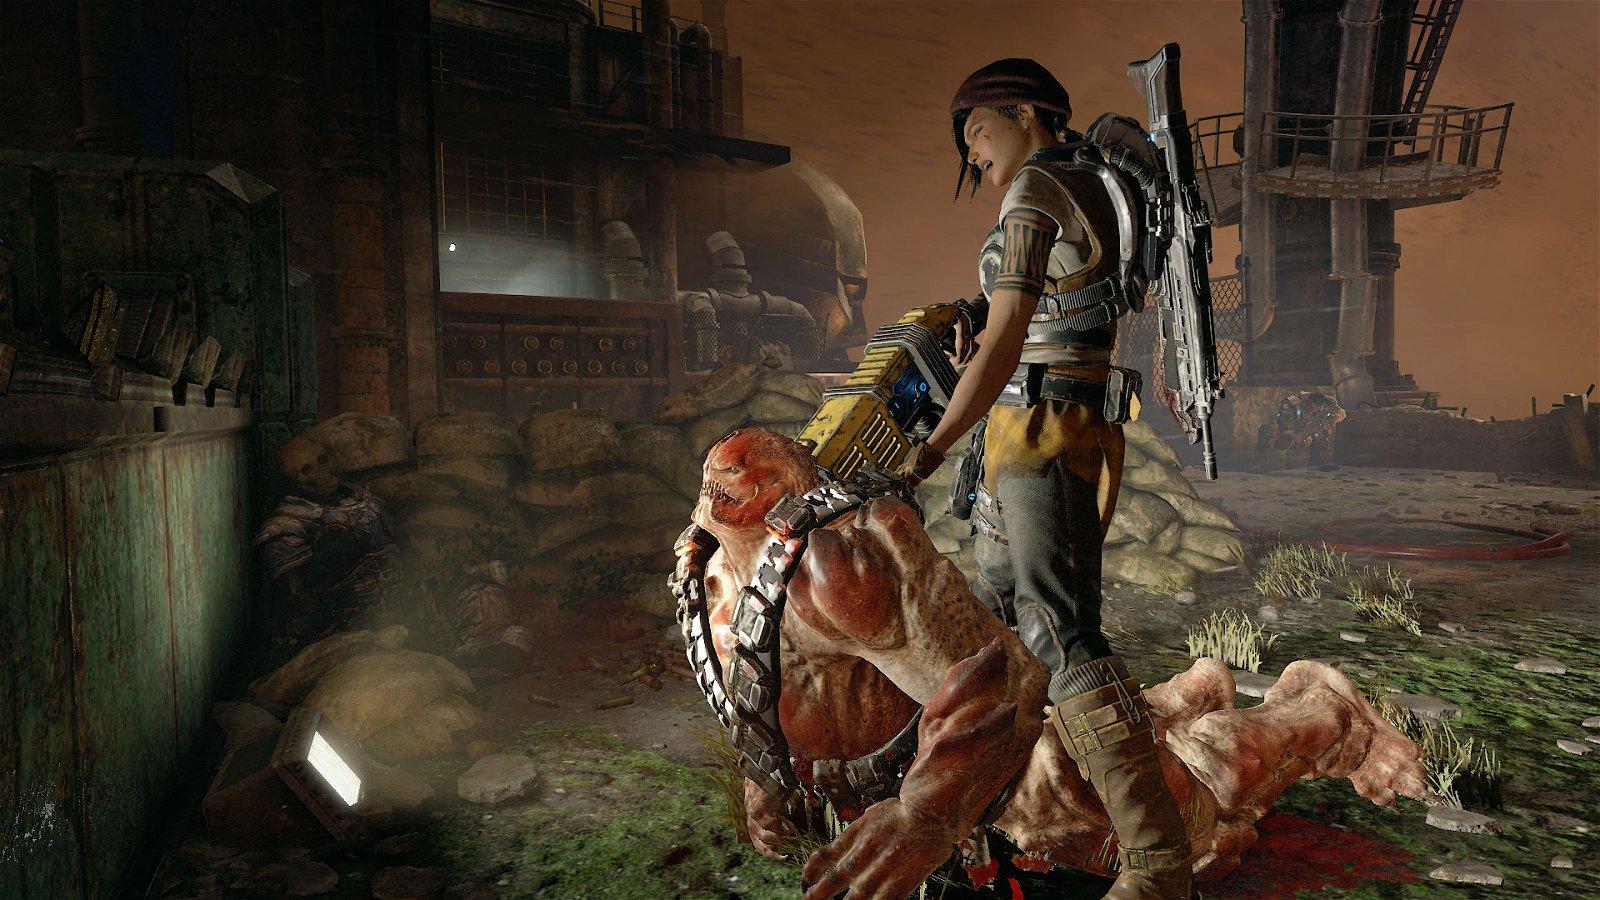 E3 2016: Gears of War 4 Behind Closed Doors 16